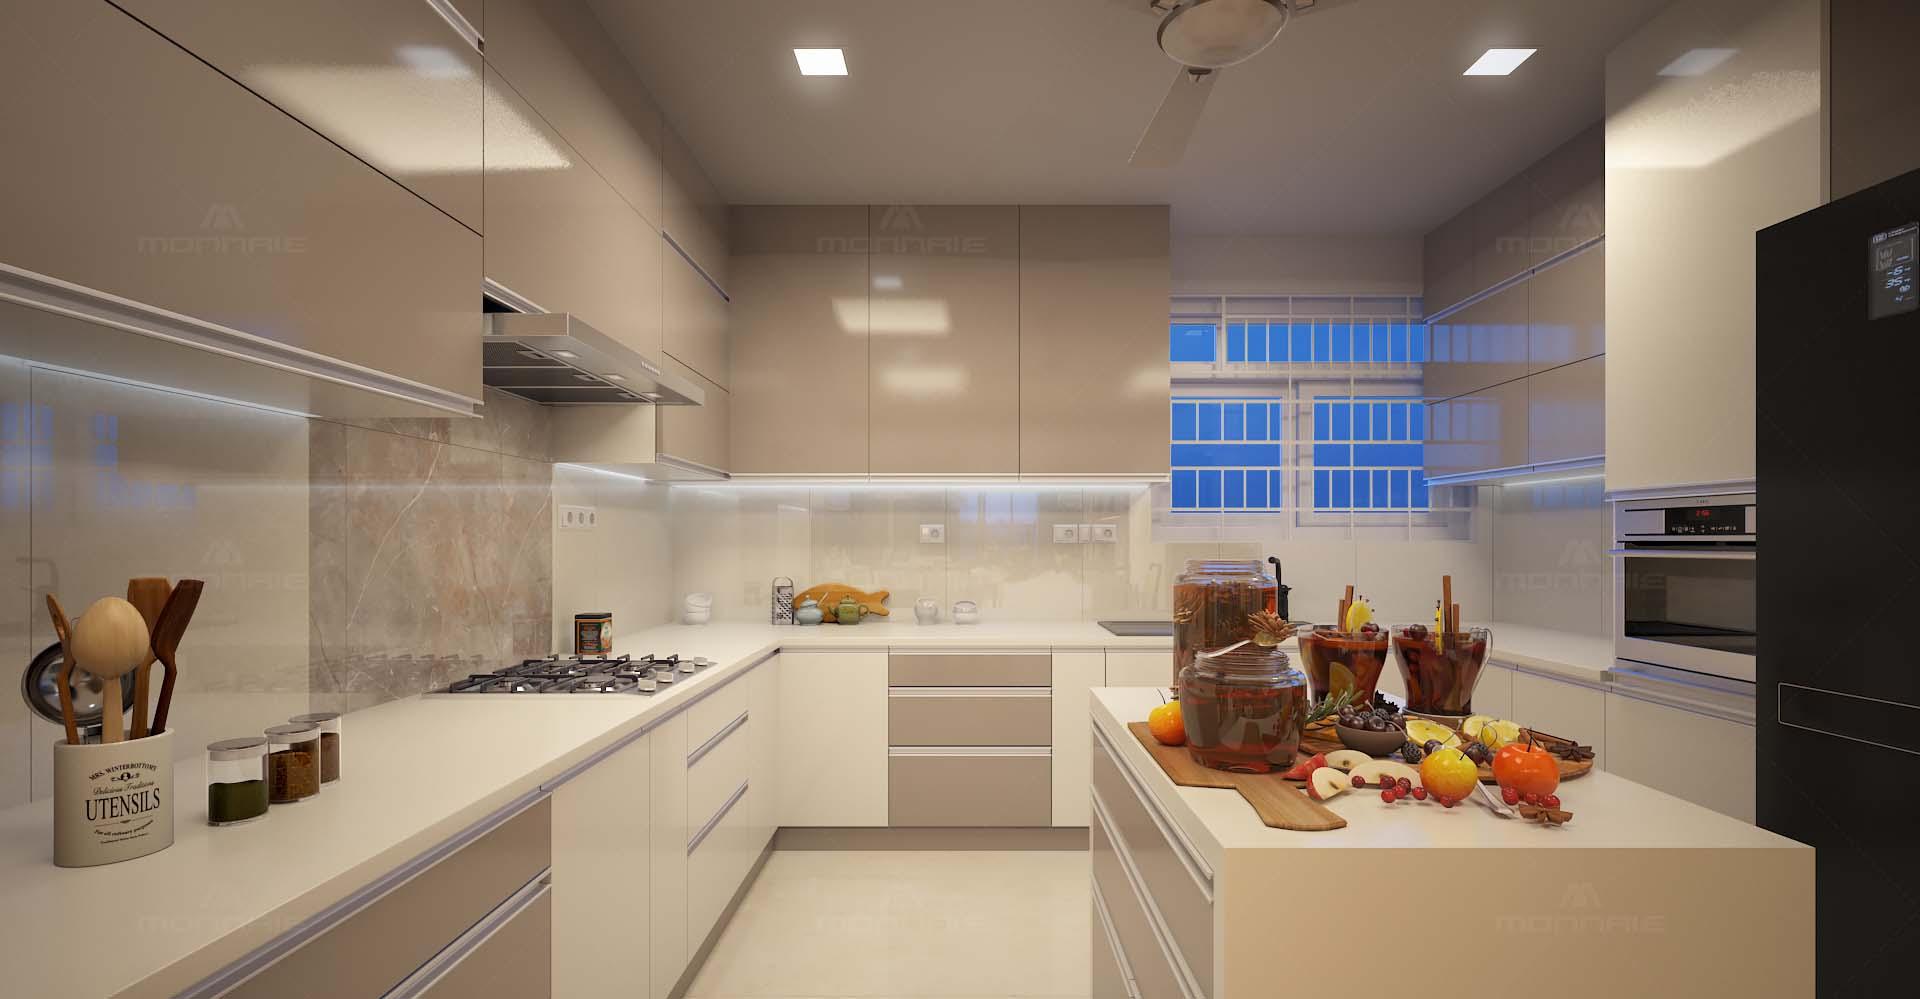 7. Modular Kitchen